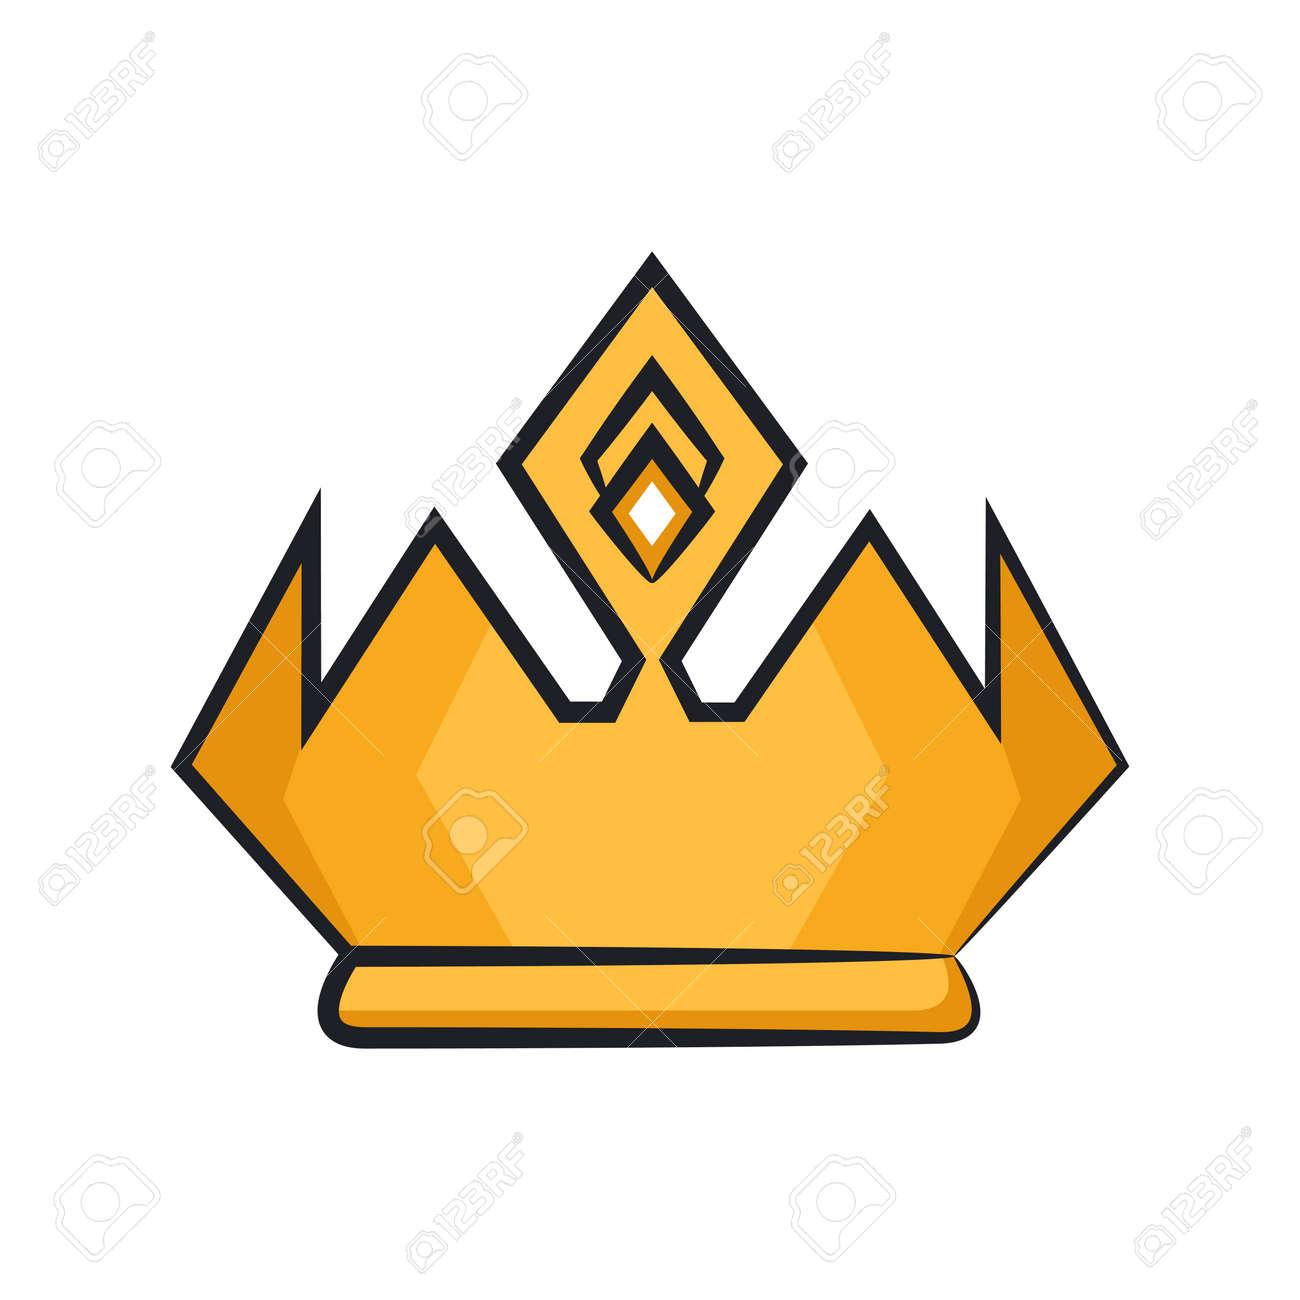 Vector Symbol Of Cartoon King Crown Royalty Free Cliparts Vectors And Stock Illustration Image 109690715 Lovepik > cartoon crown images 290000+ results. vector symbol of cartoon king crown